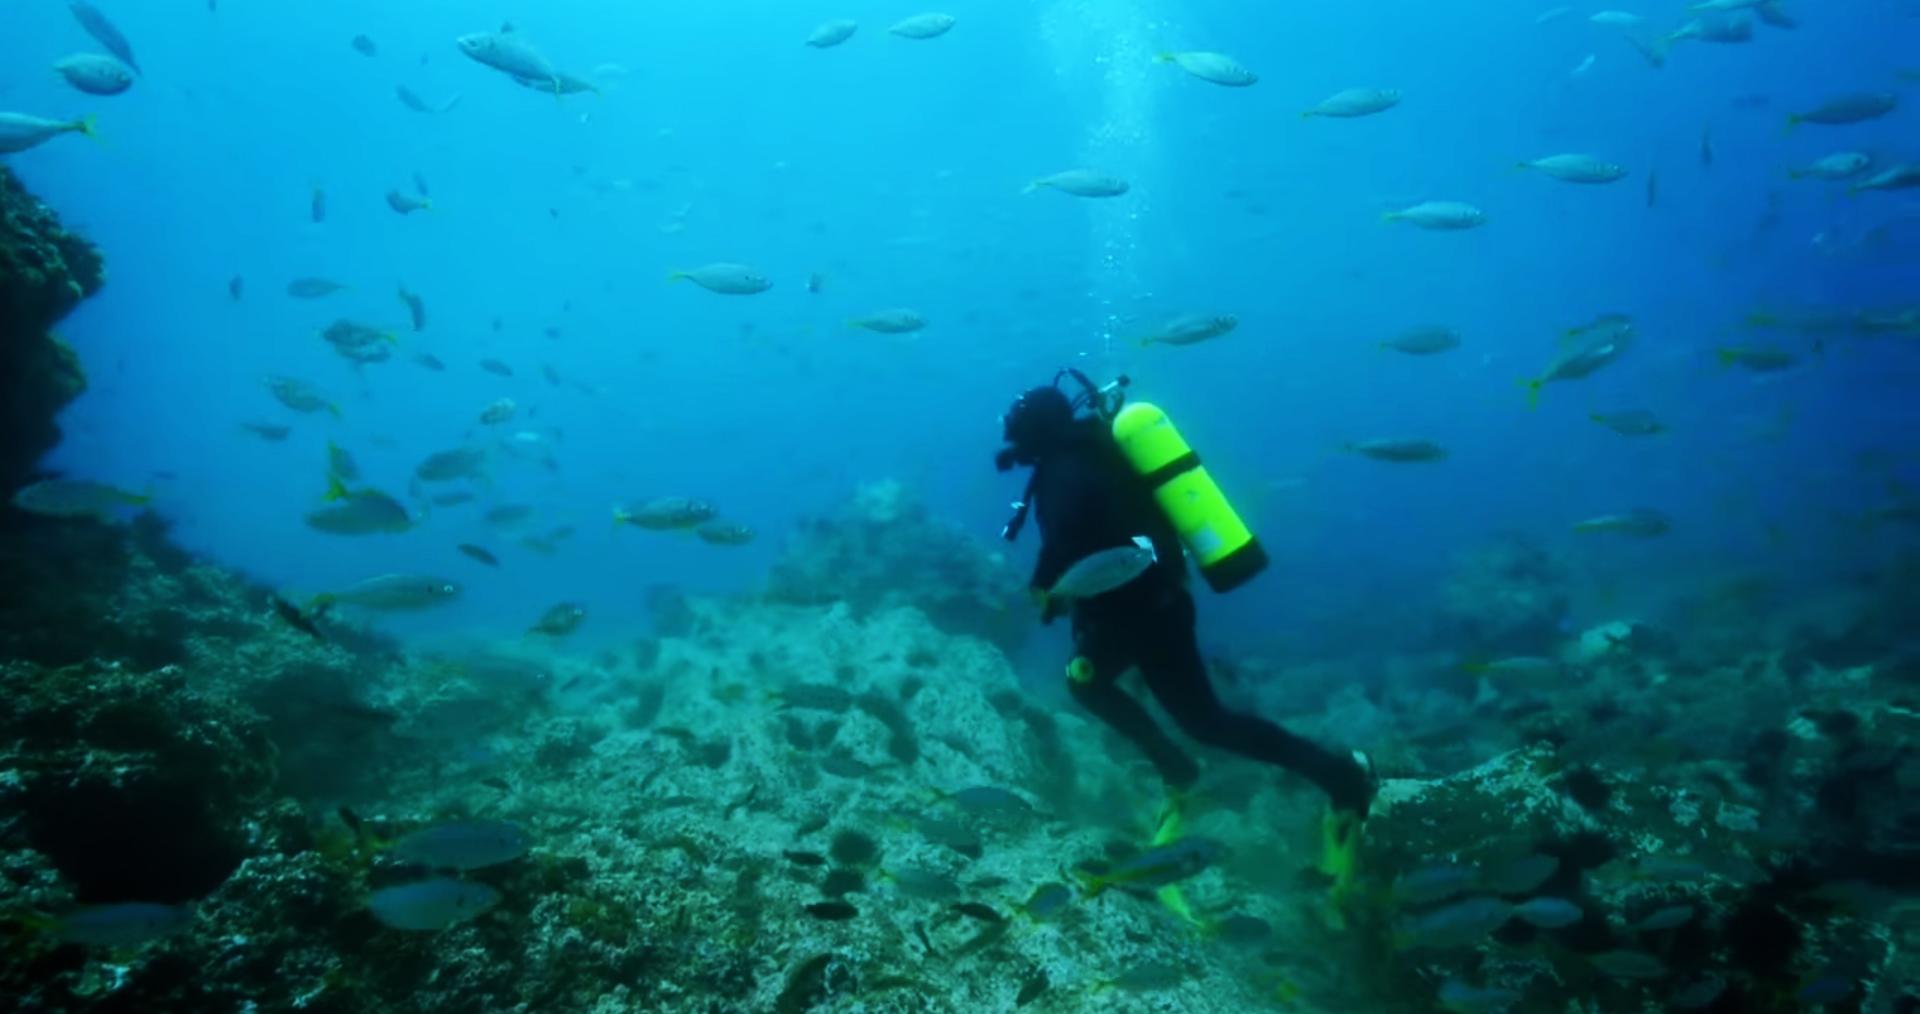 Scuba Diving in Chile